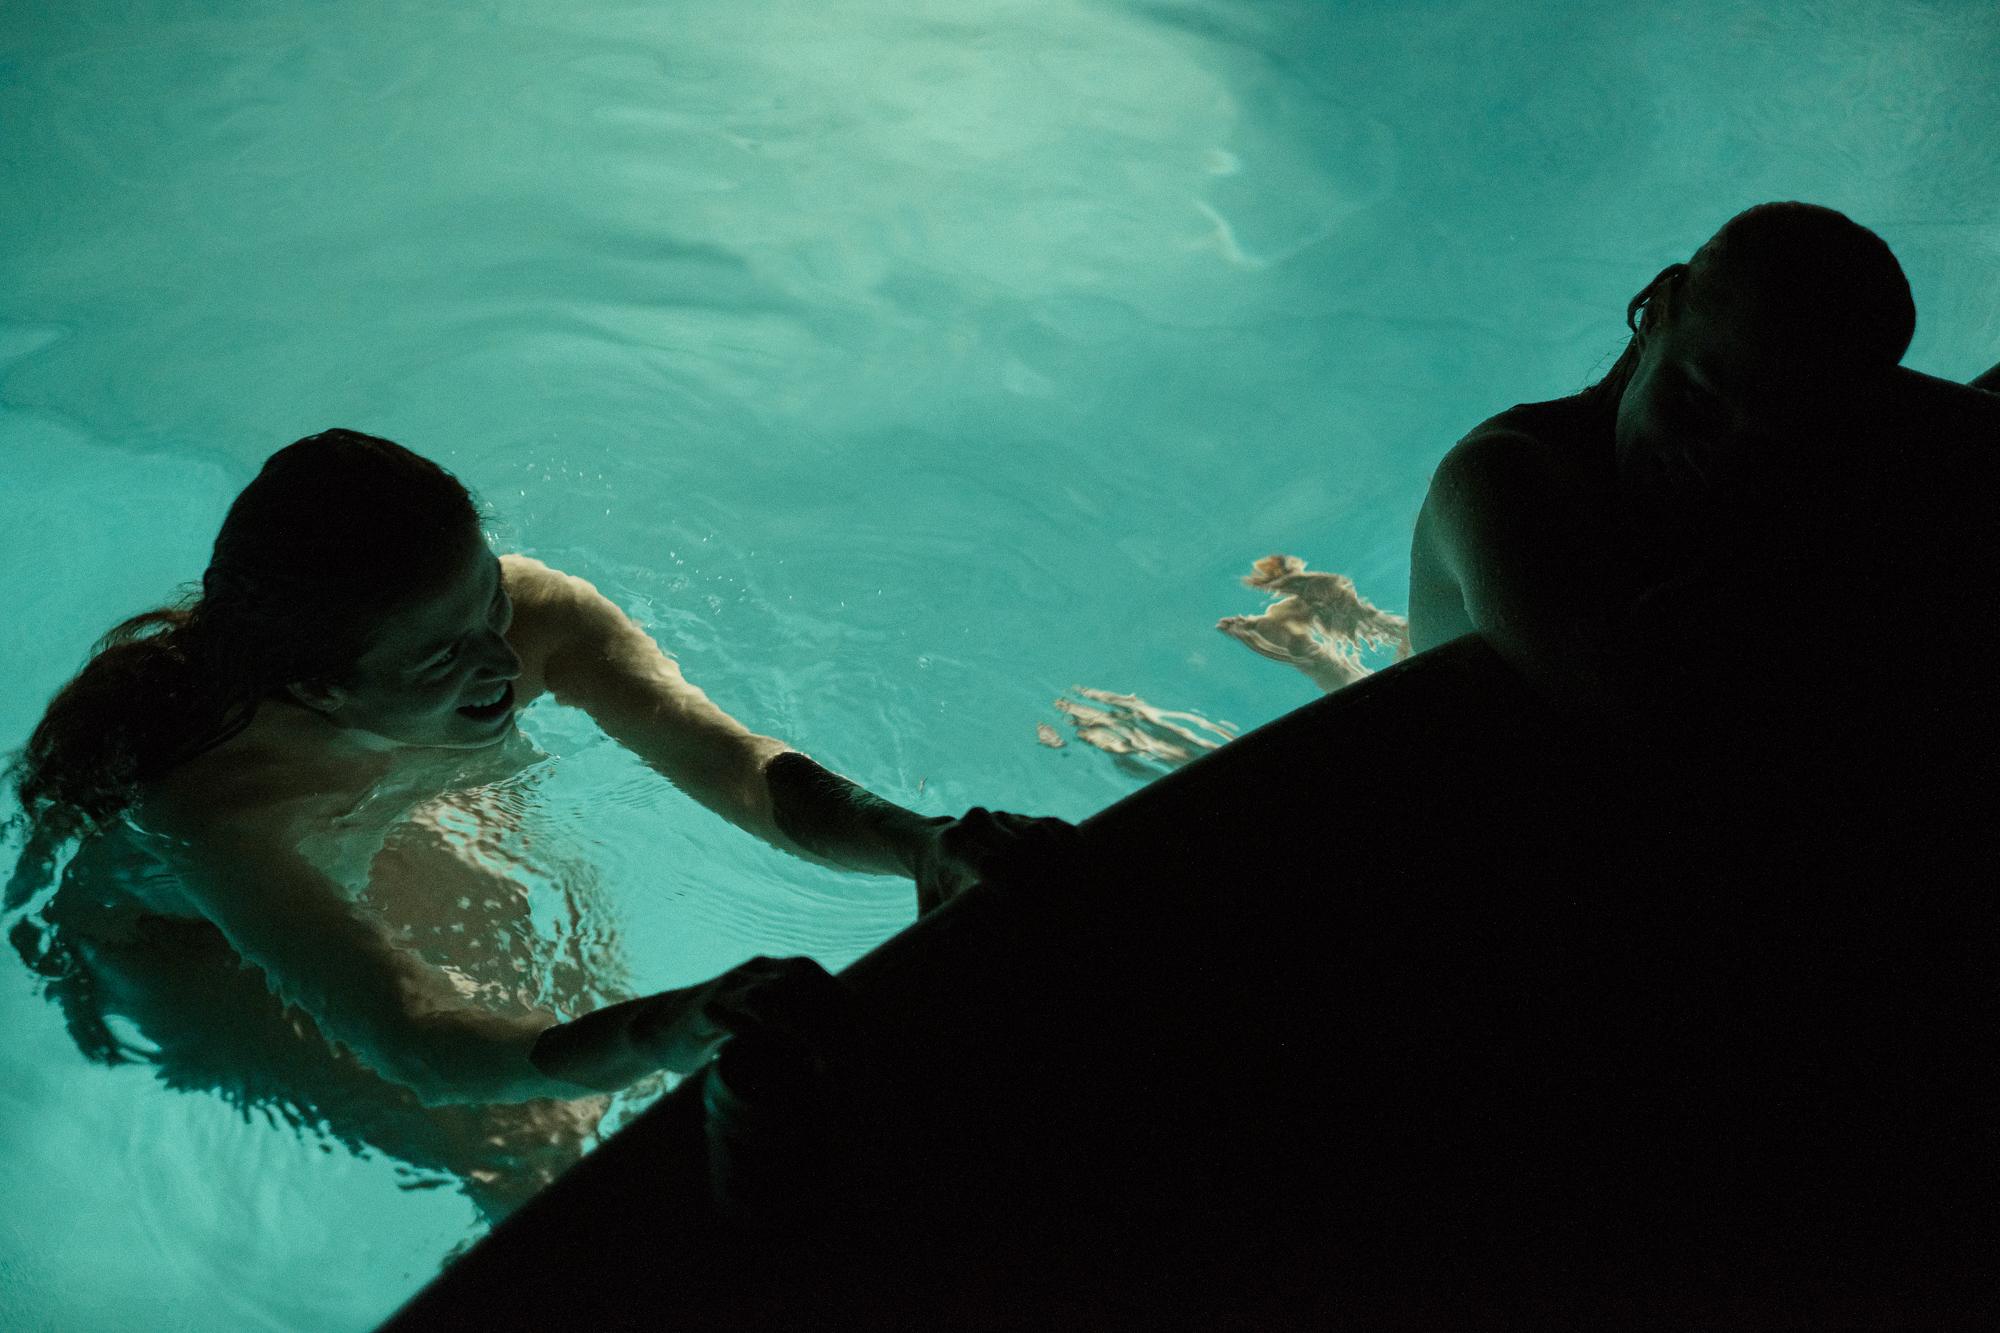 20170619-Ariane-Cassidy-Hannah-swimming-pool-X-Pro2-0261-Edit.jpg